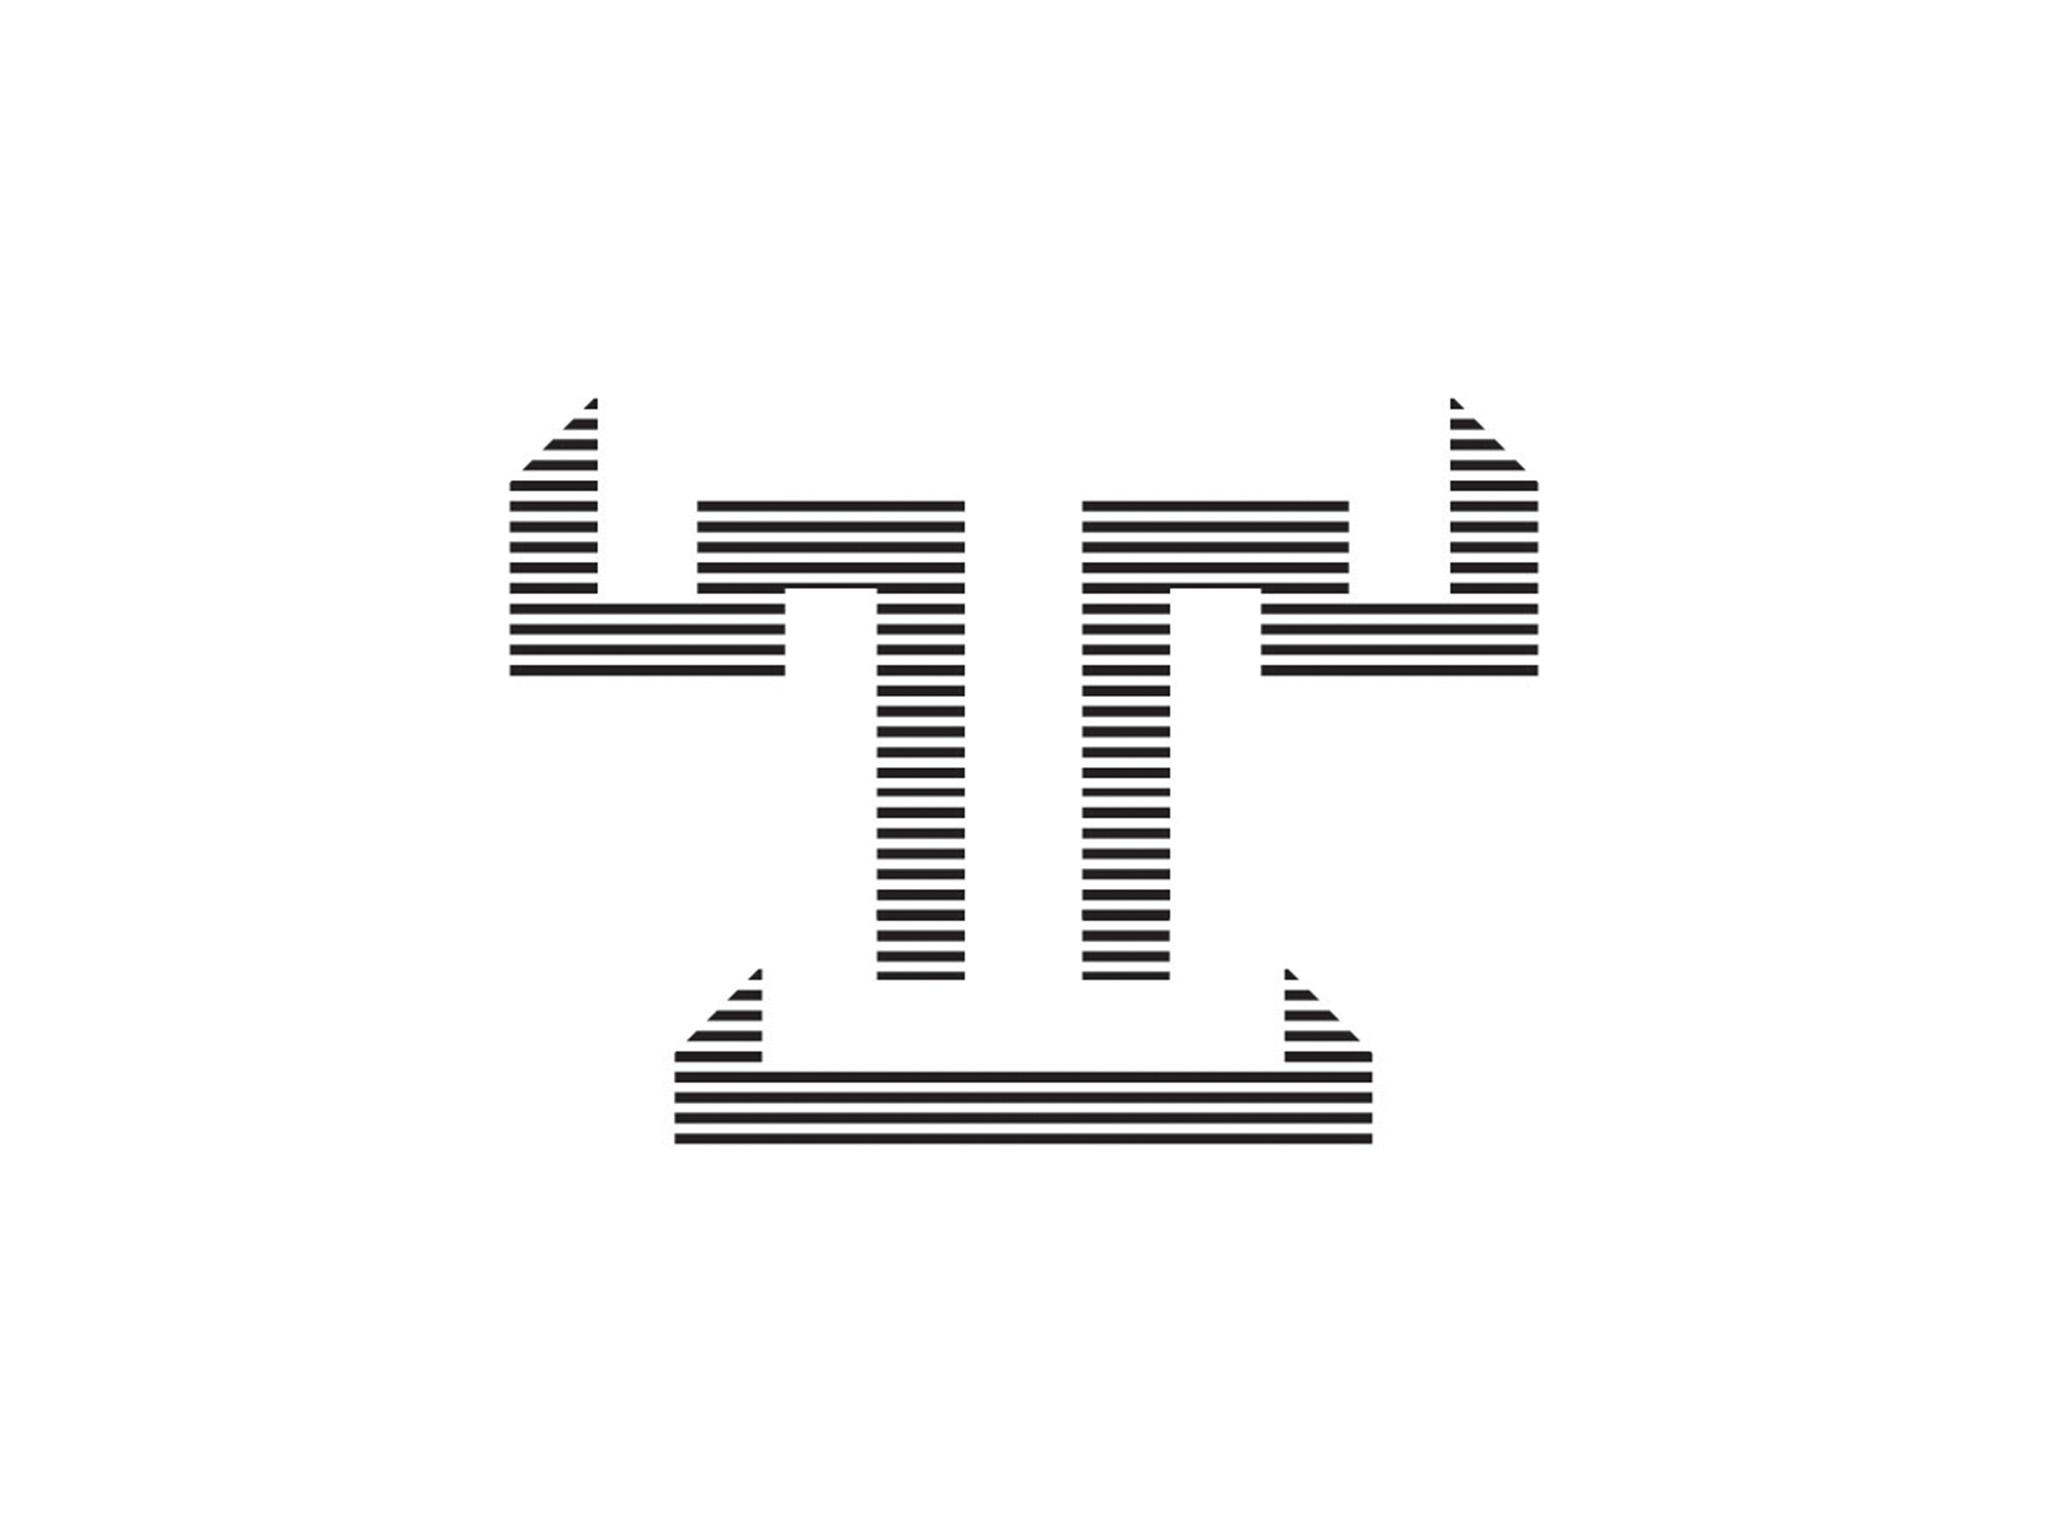 apex_letters_horizontal_large_0020_2_final_alphabet coasters-20.jpg